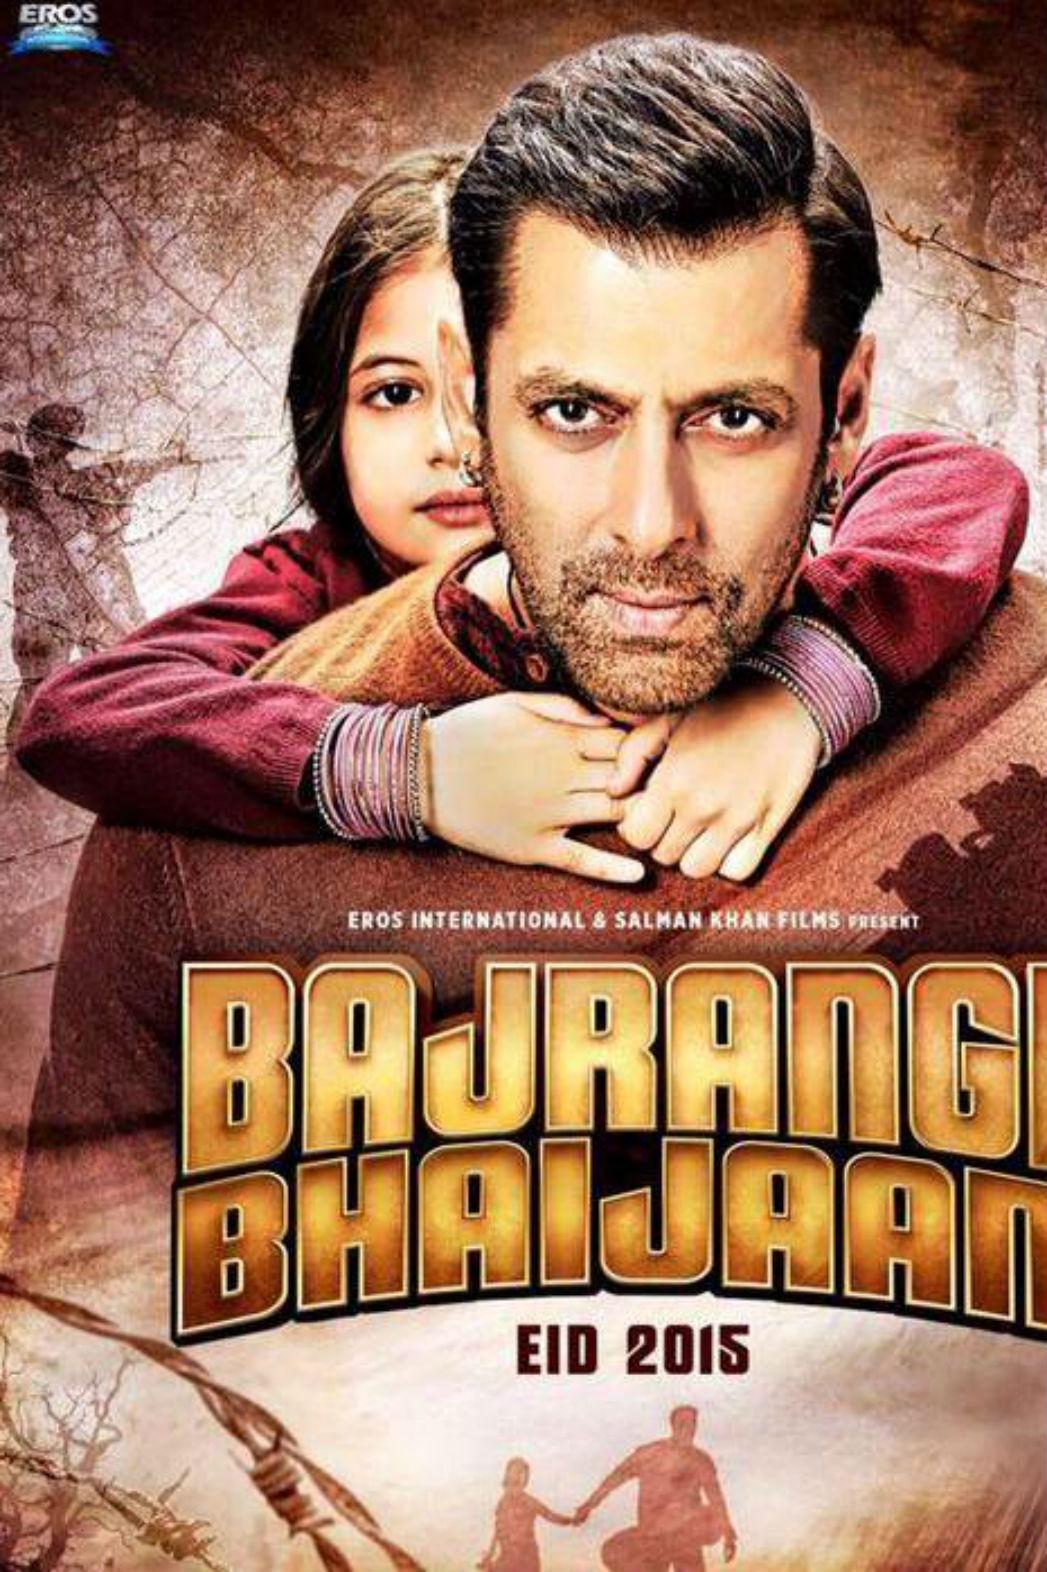 'Bajrangi Bhaijaan' poster - P 2015